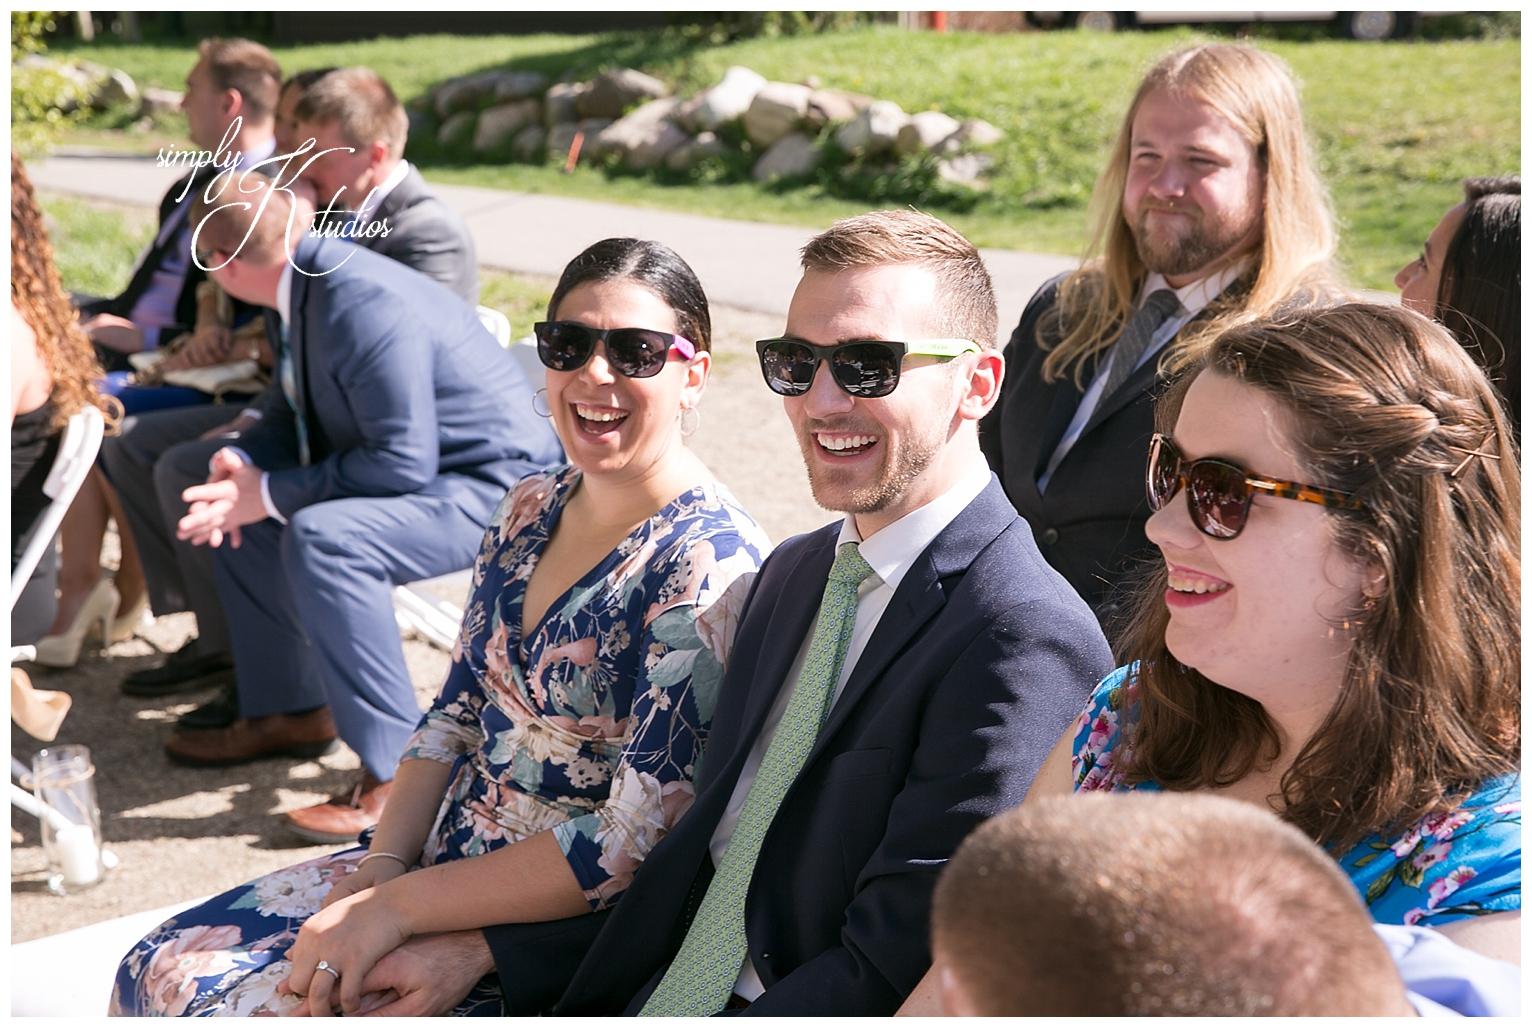 Wedding Guests in CO.jpg